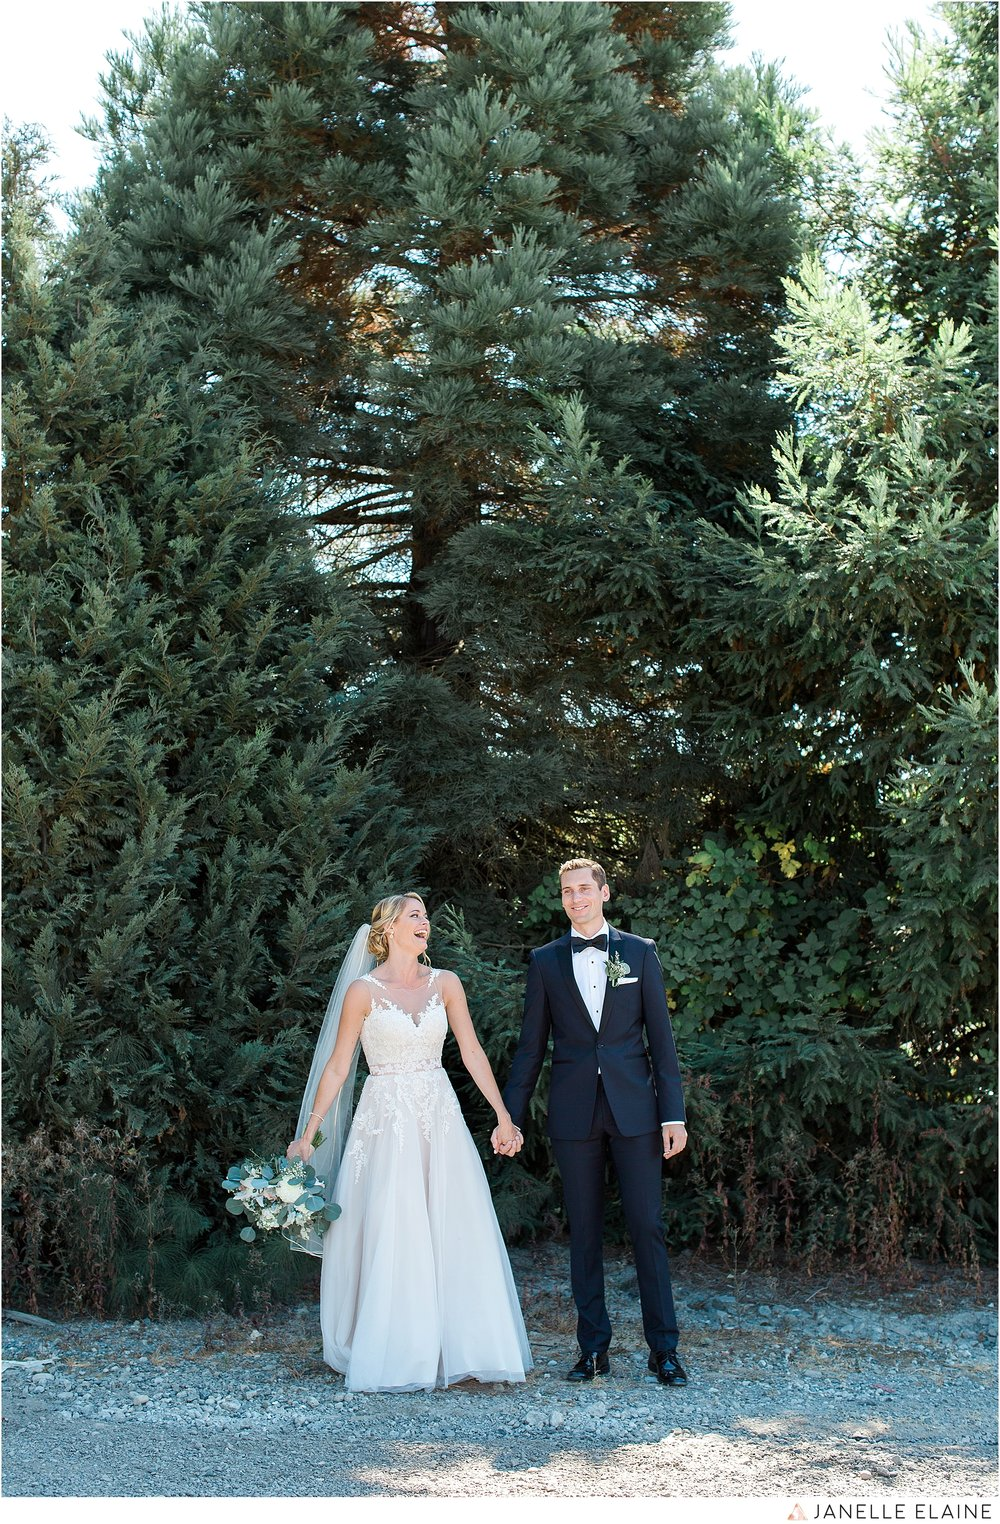 janelle elaine photography-carleton farms-washington-wedding-lake stevens-71.jpg